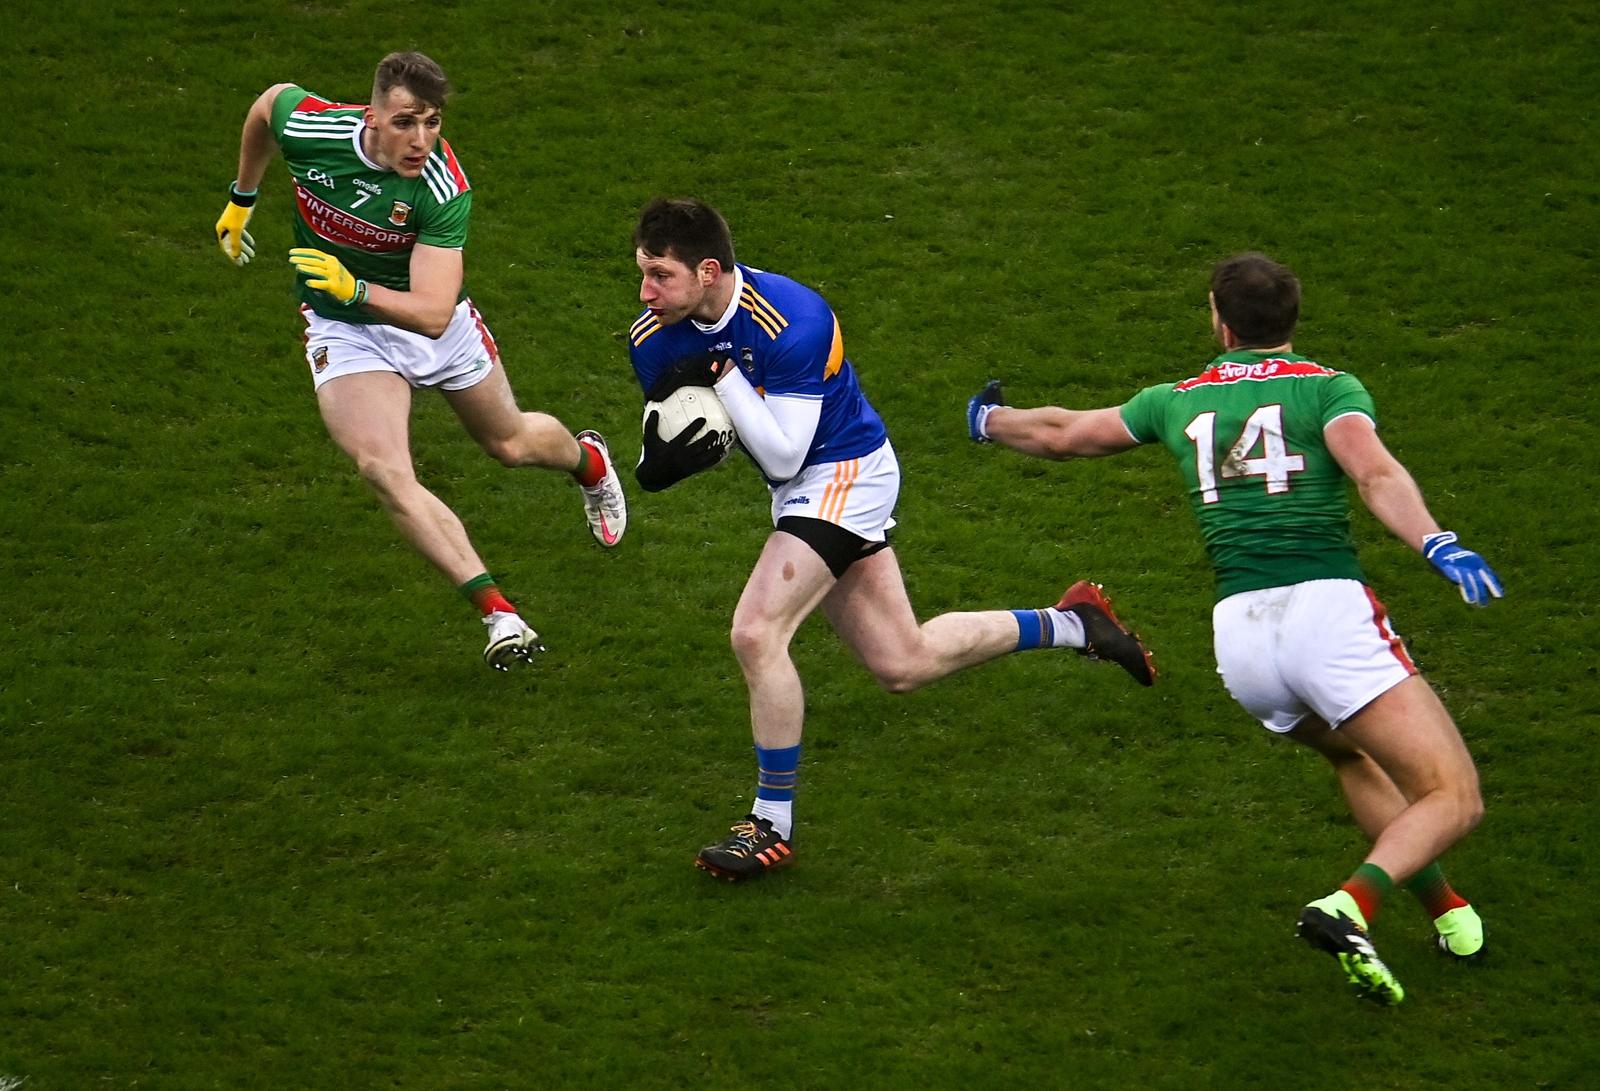 Image - Tipp's Jimmy Feehan bursts past Eoghan McLaughlin and Aidan O'Shea during the 2020 semi-final